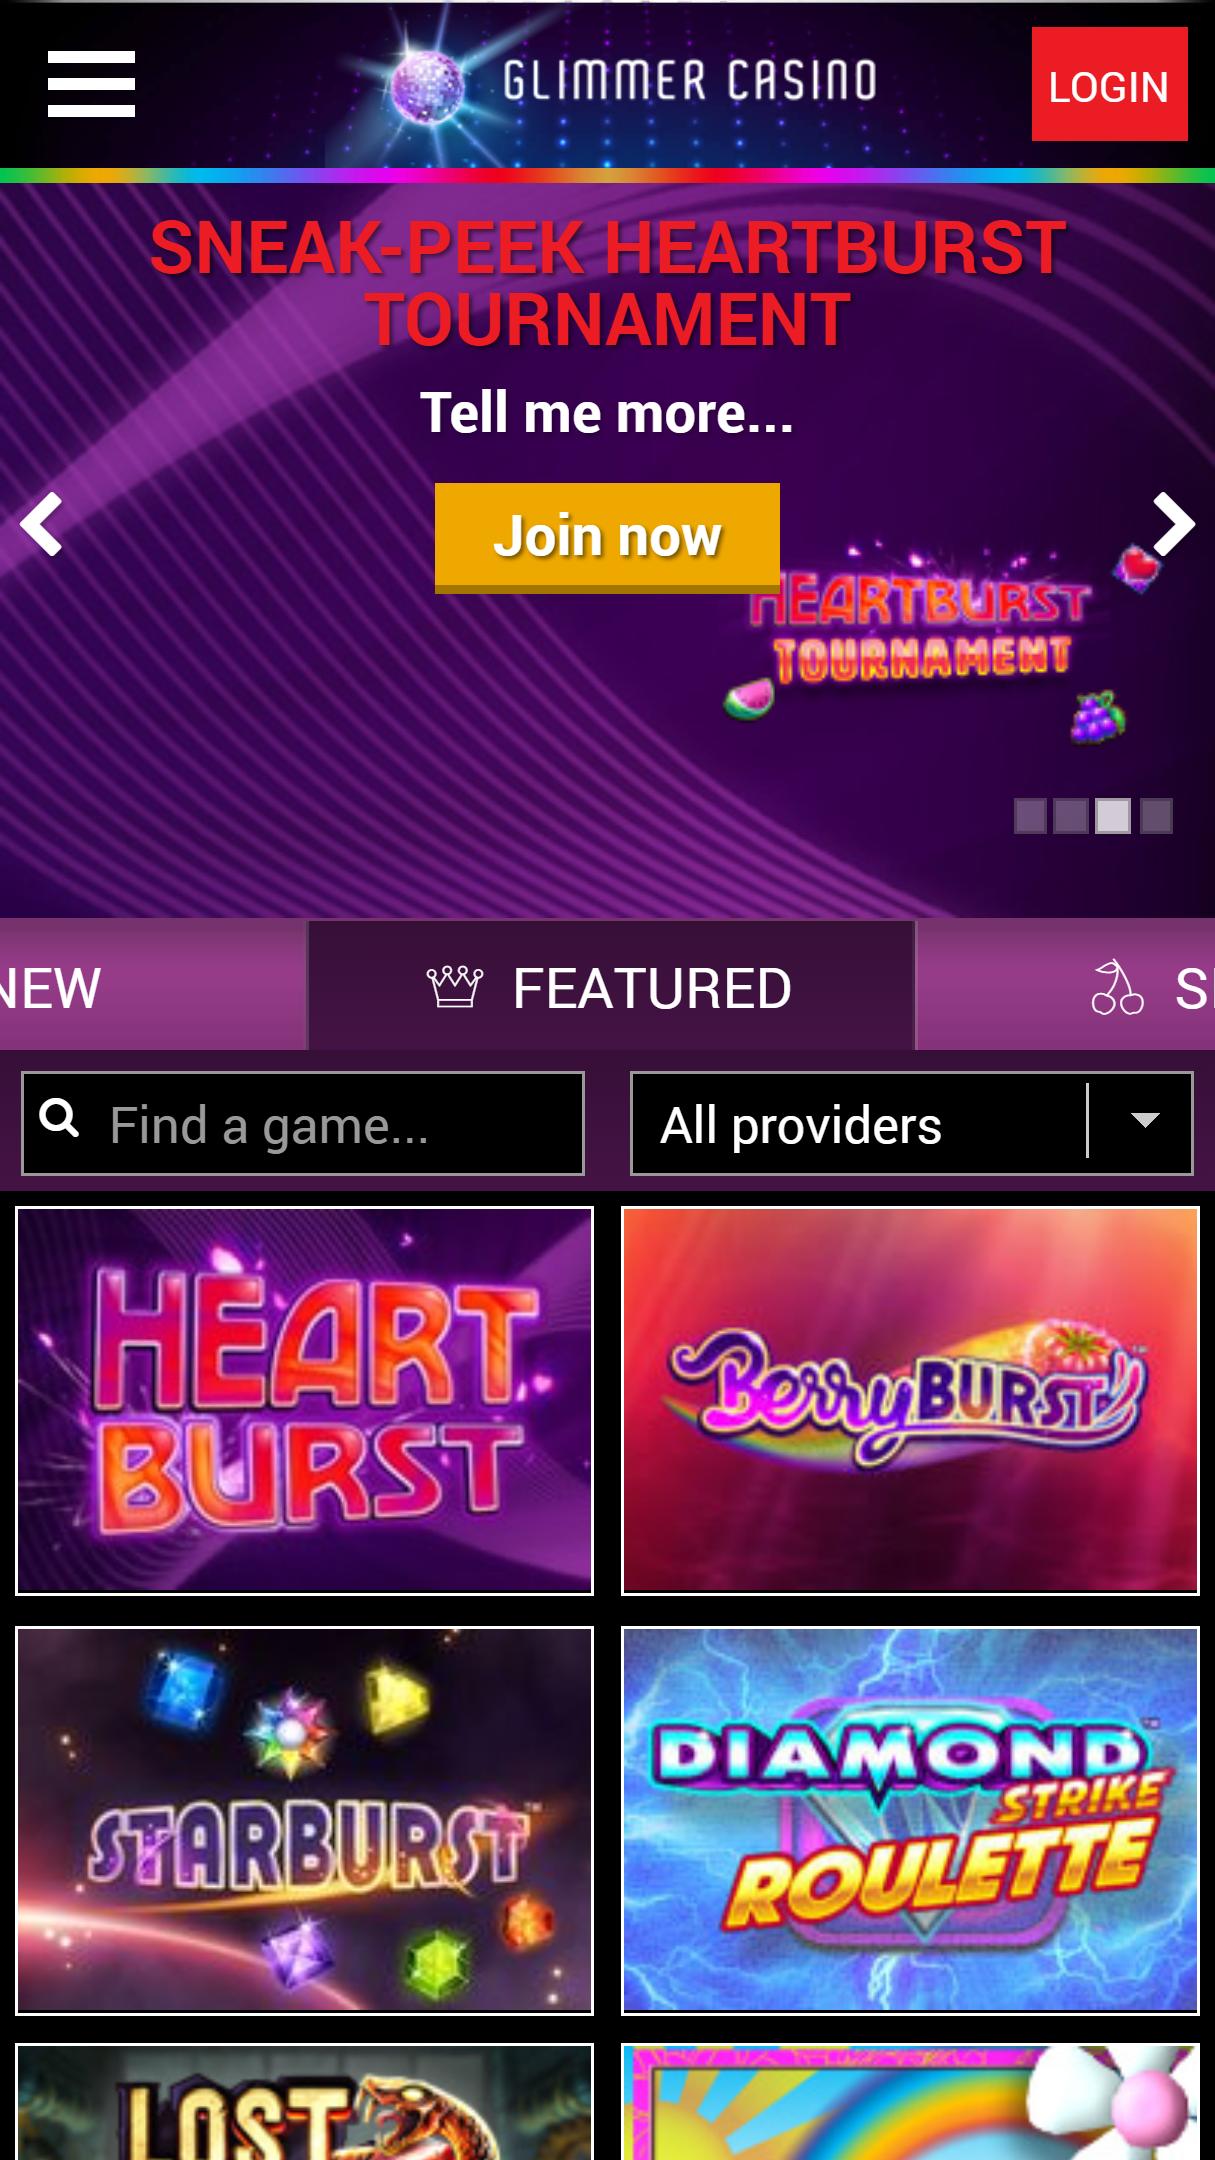 Glimmer Casino App Homepage